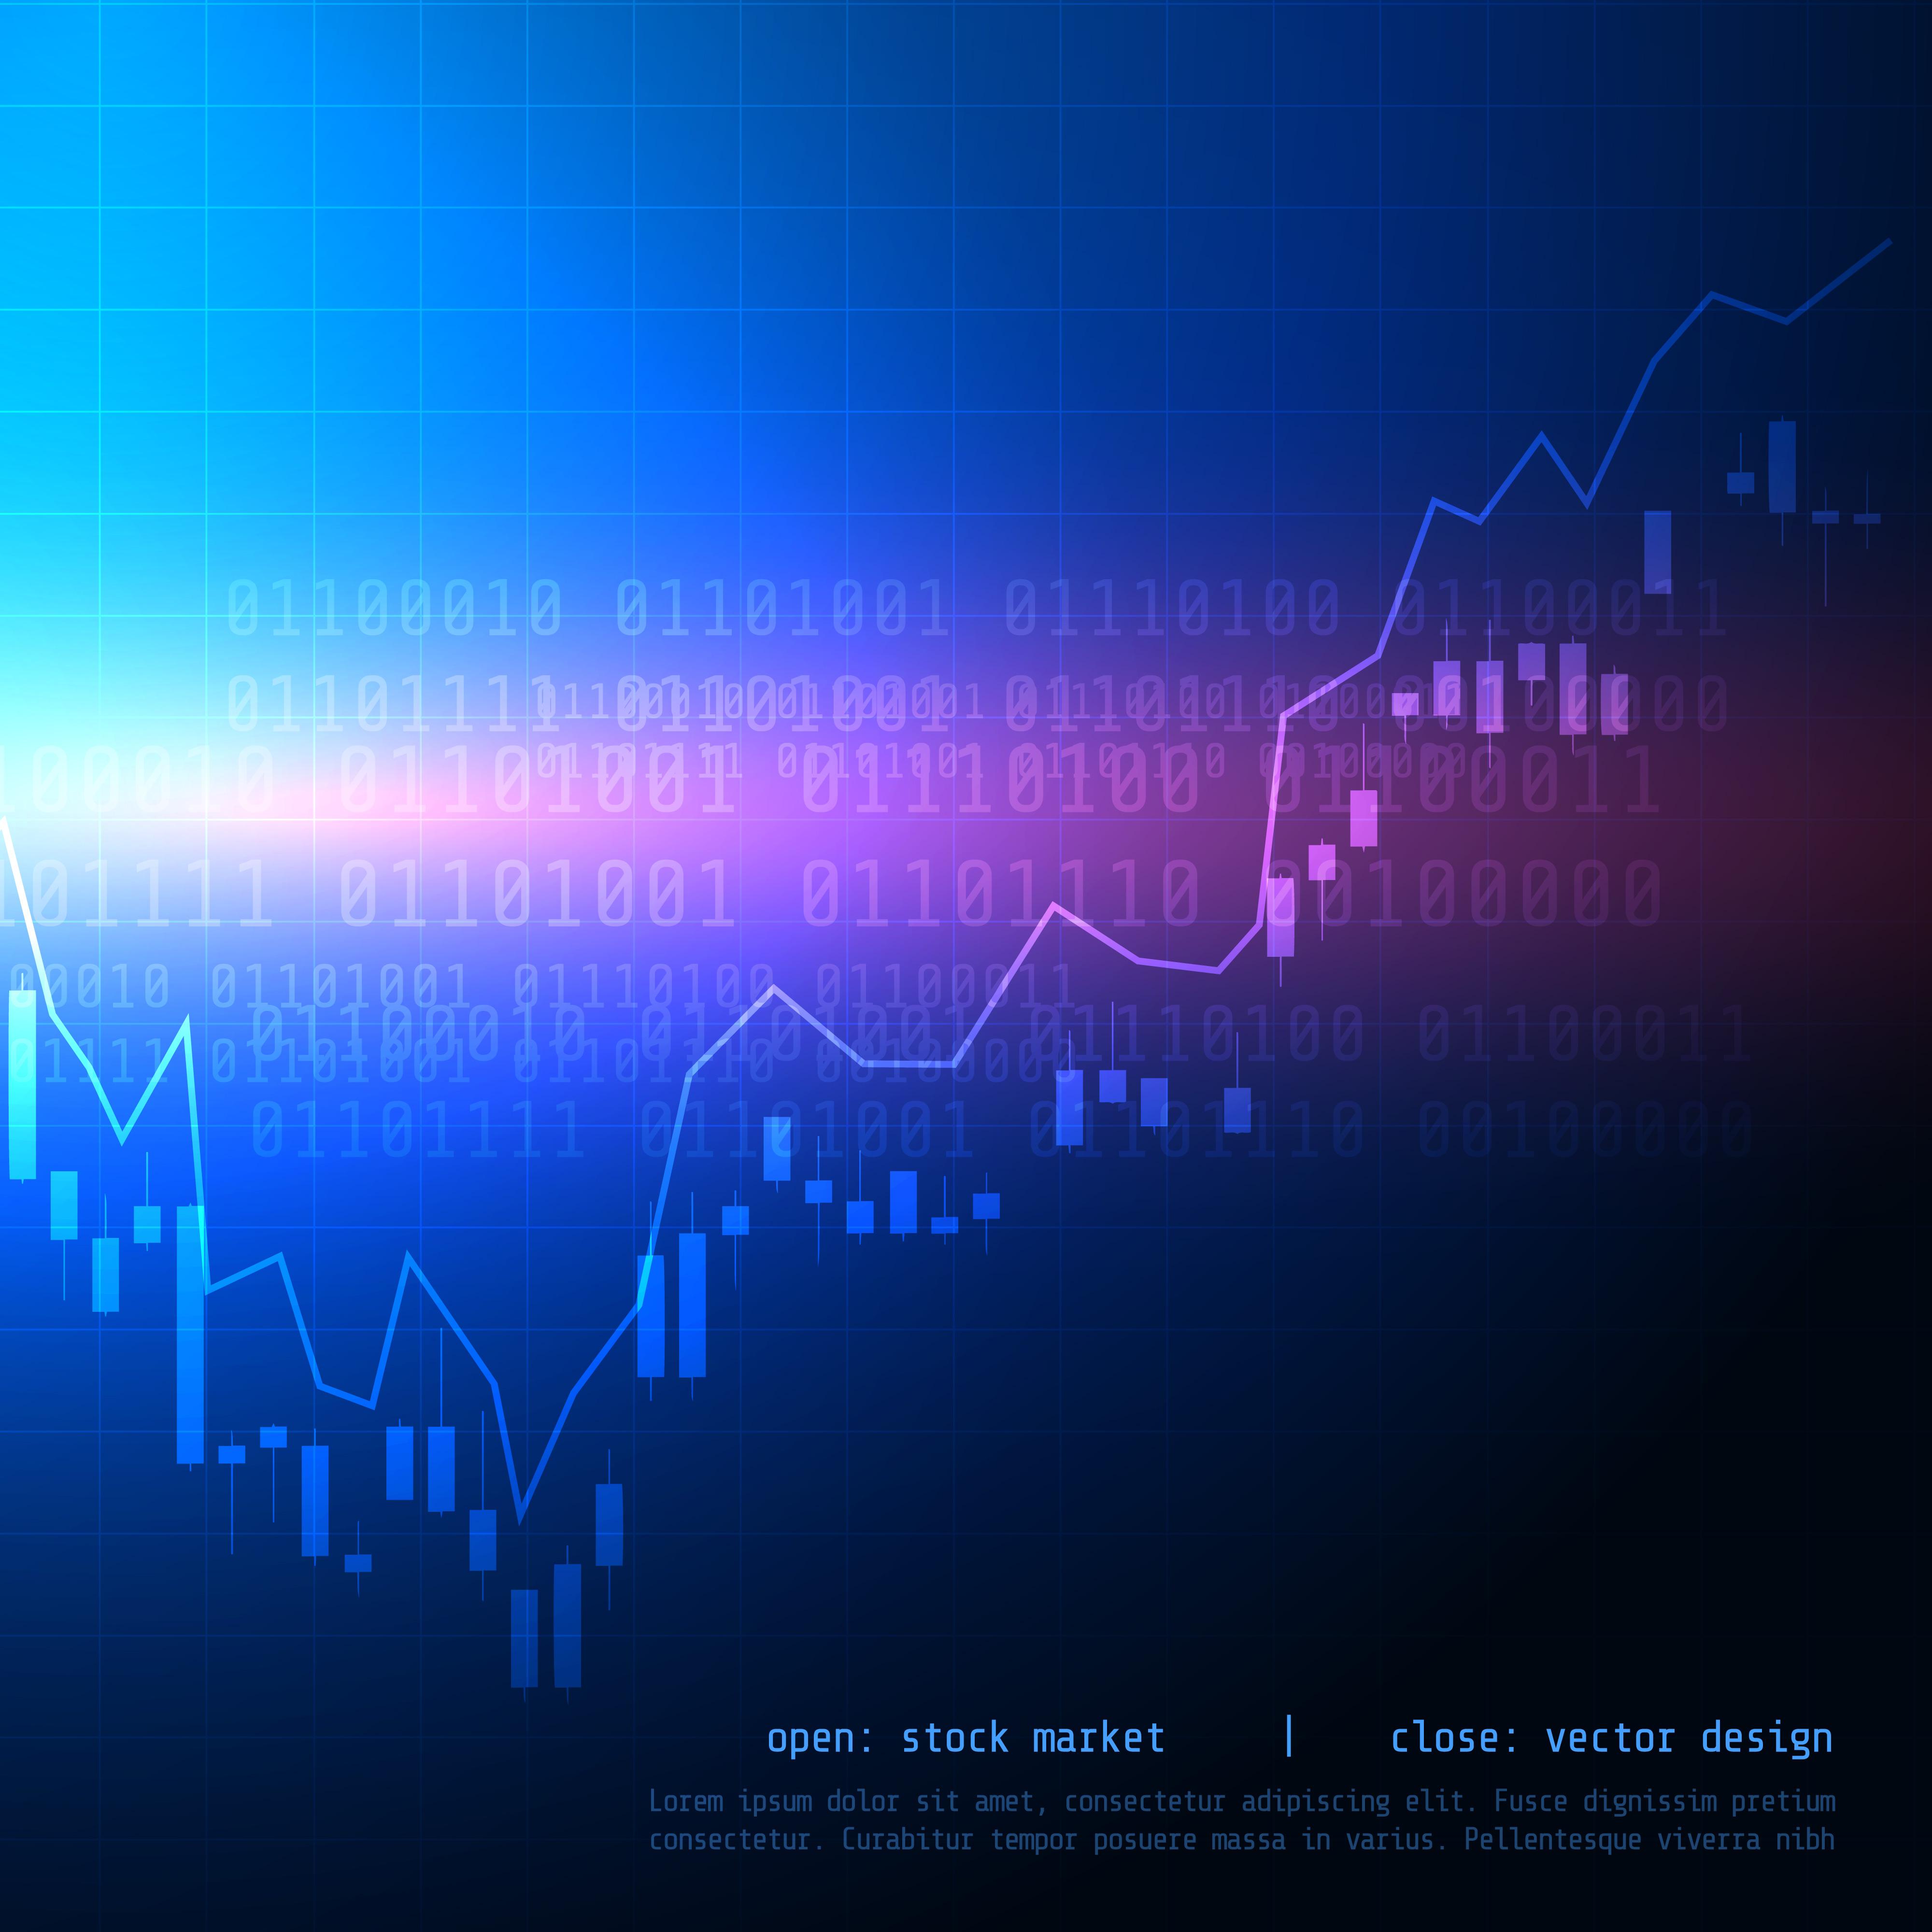 Icons Trading Error Log: Candle Stick Stock Market Trading Chart With Bullish High